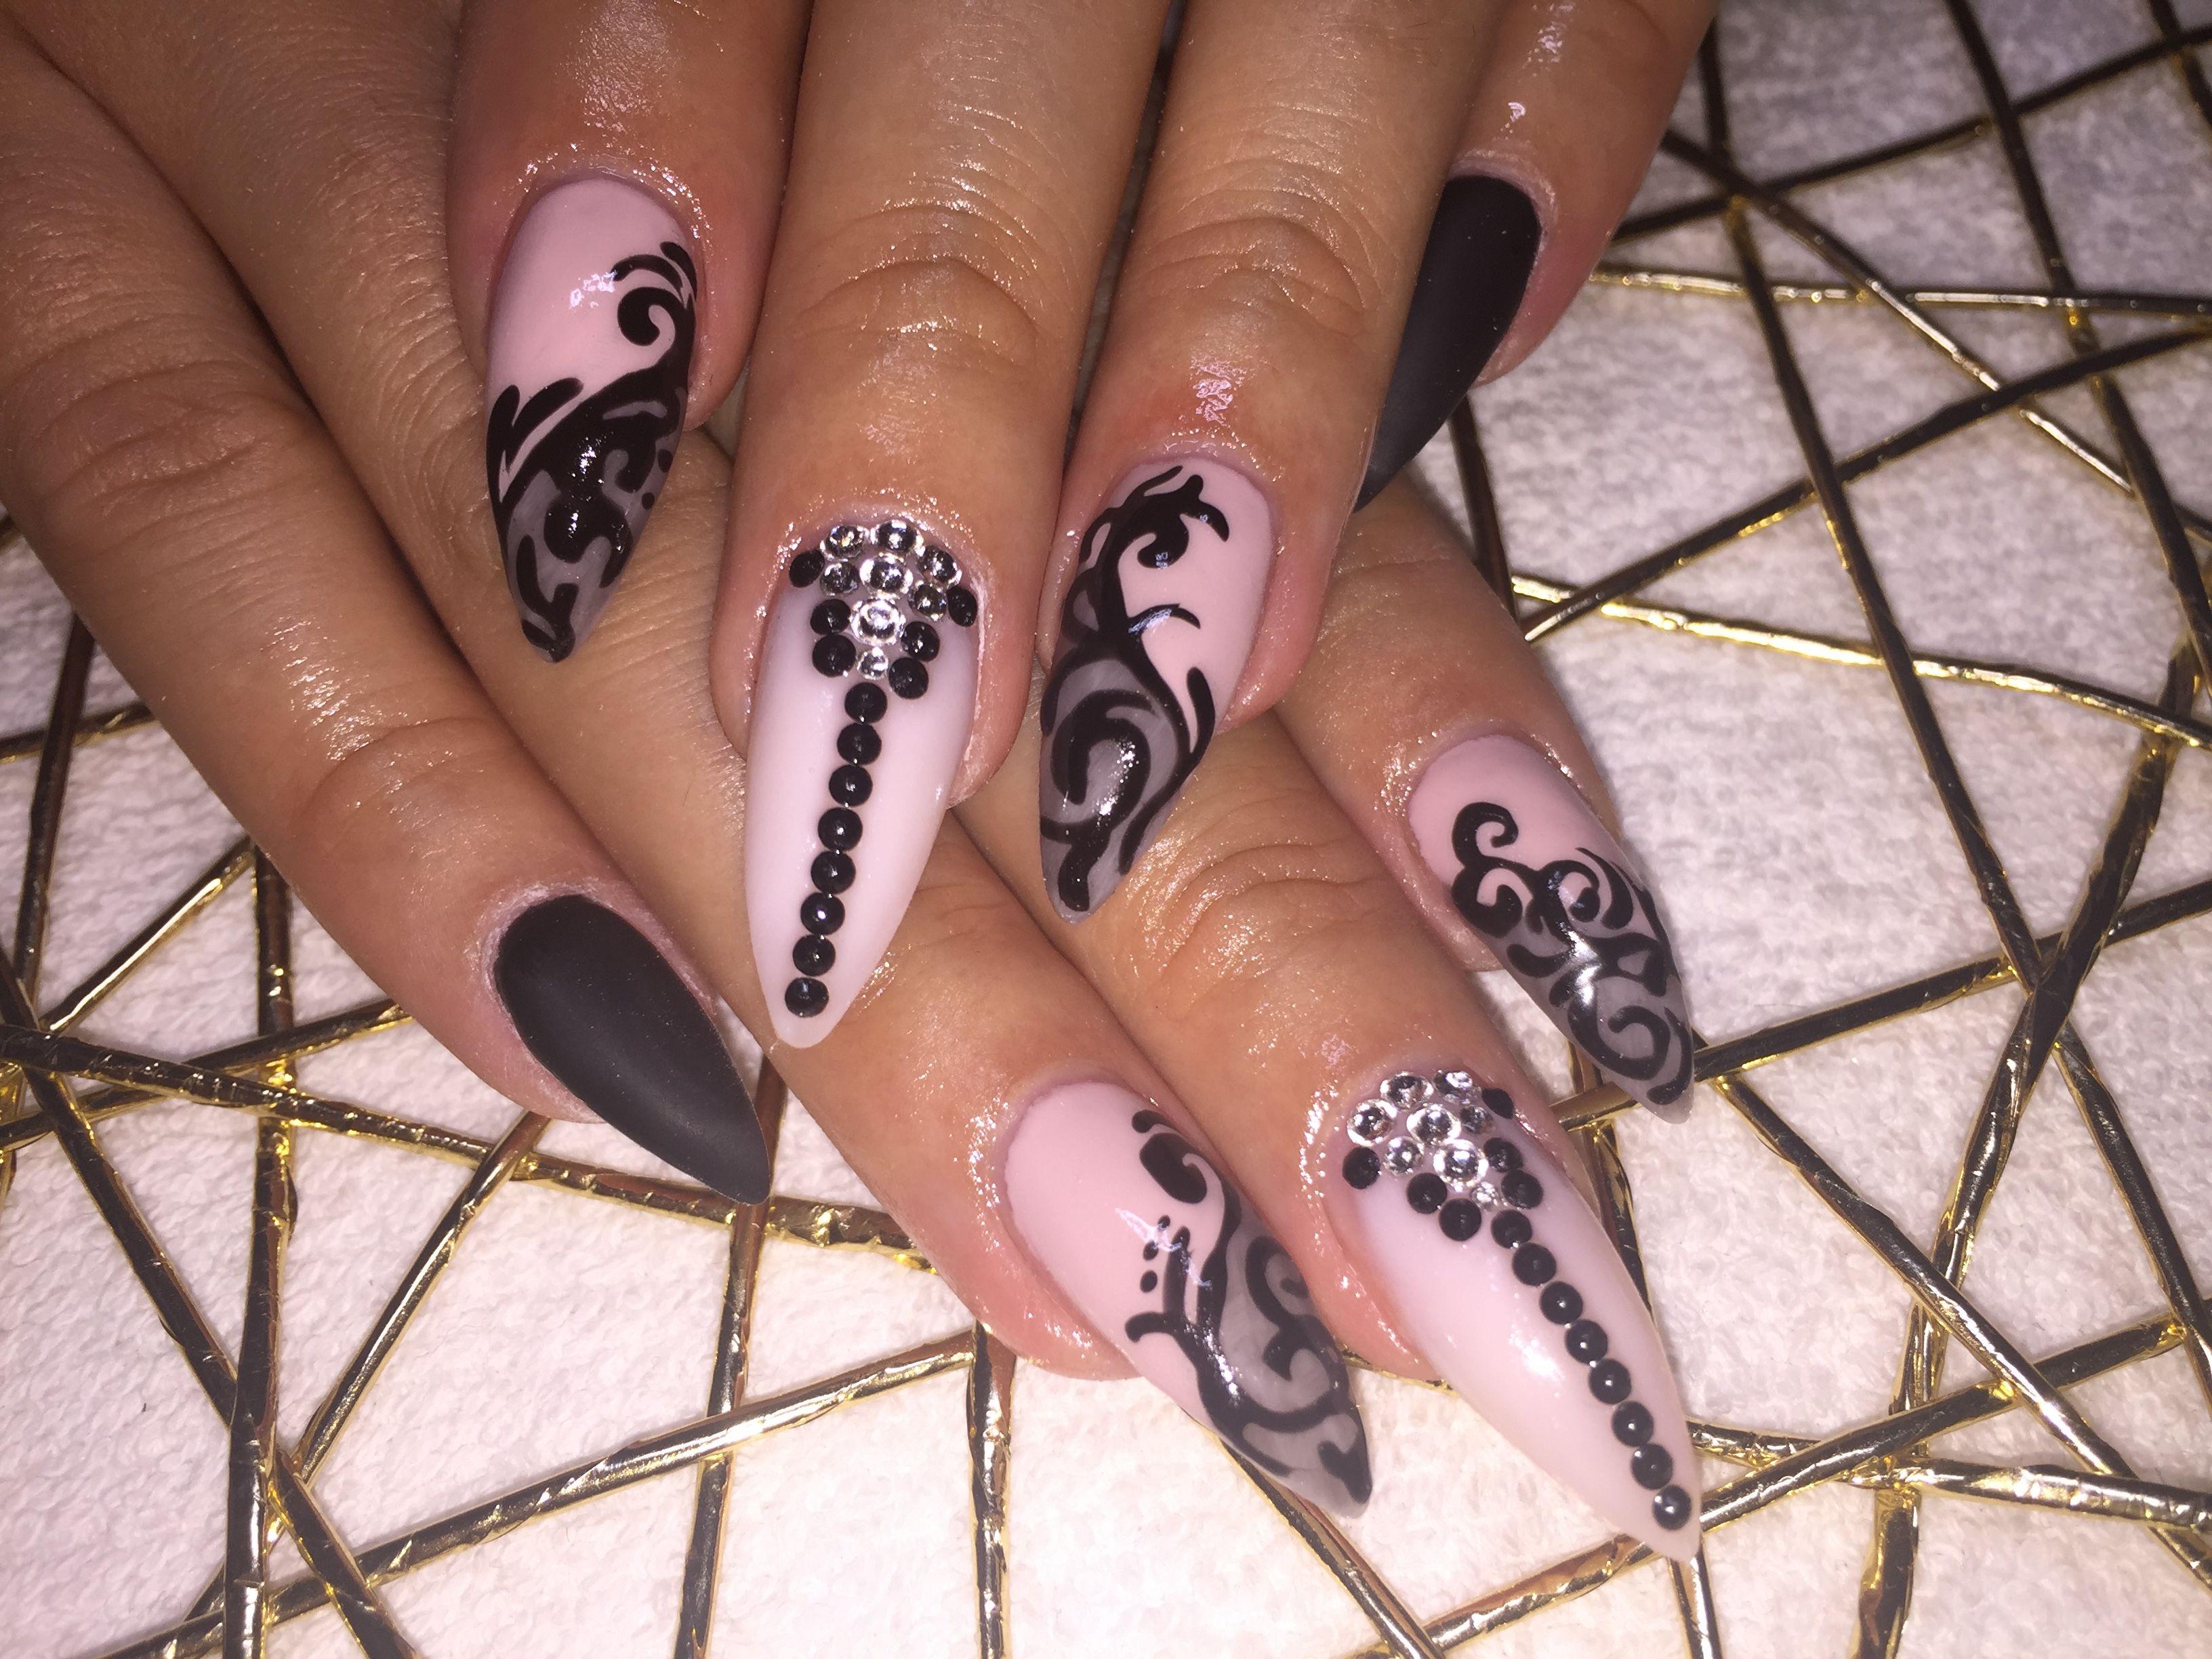 Pin By Ruth Landeta On Uas Pinterest Nail Inspo Art Nails And